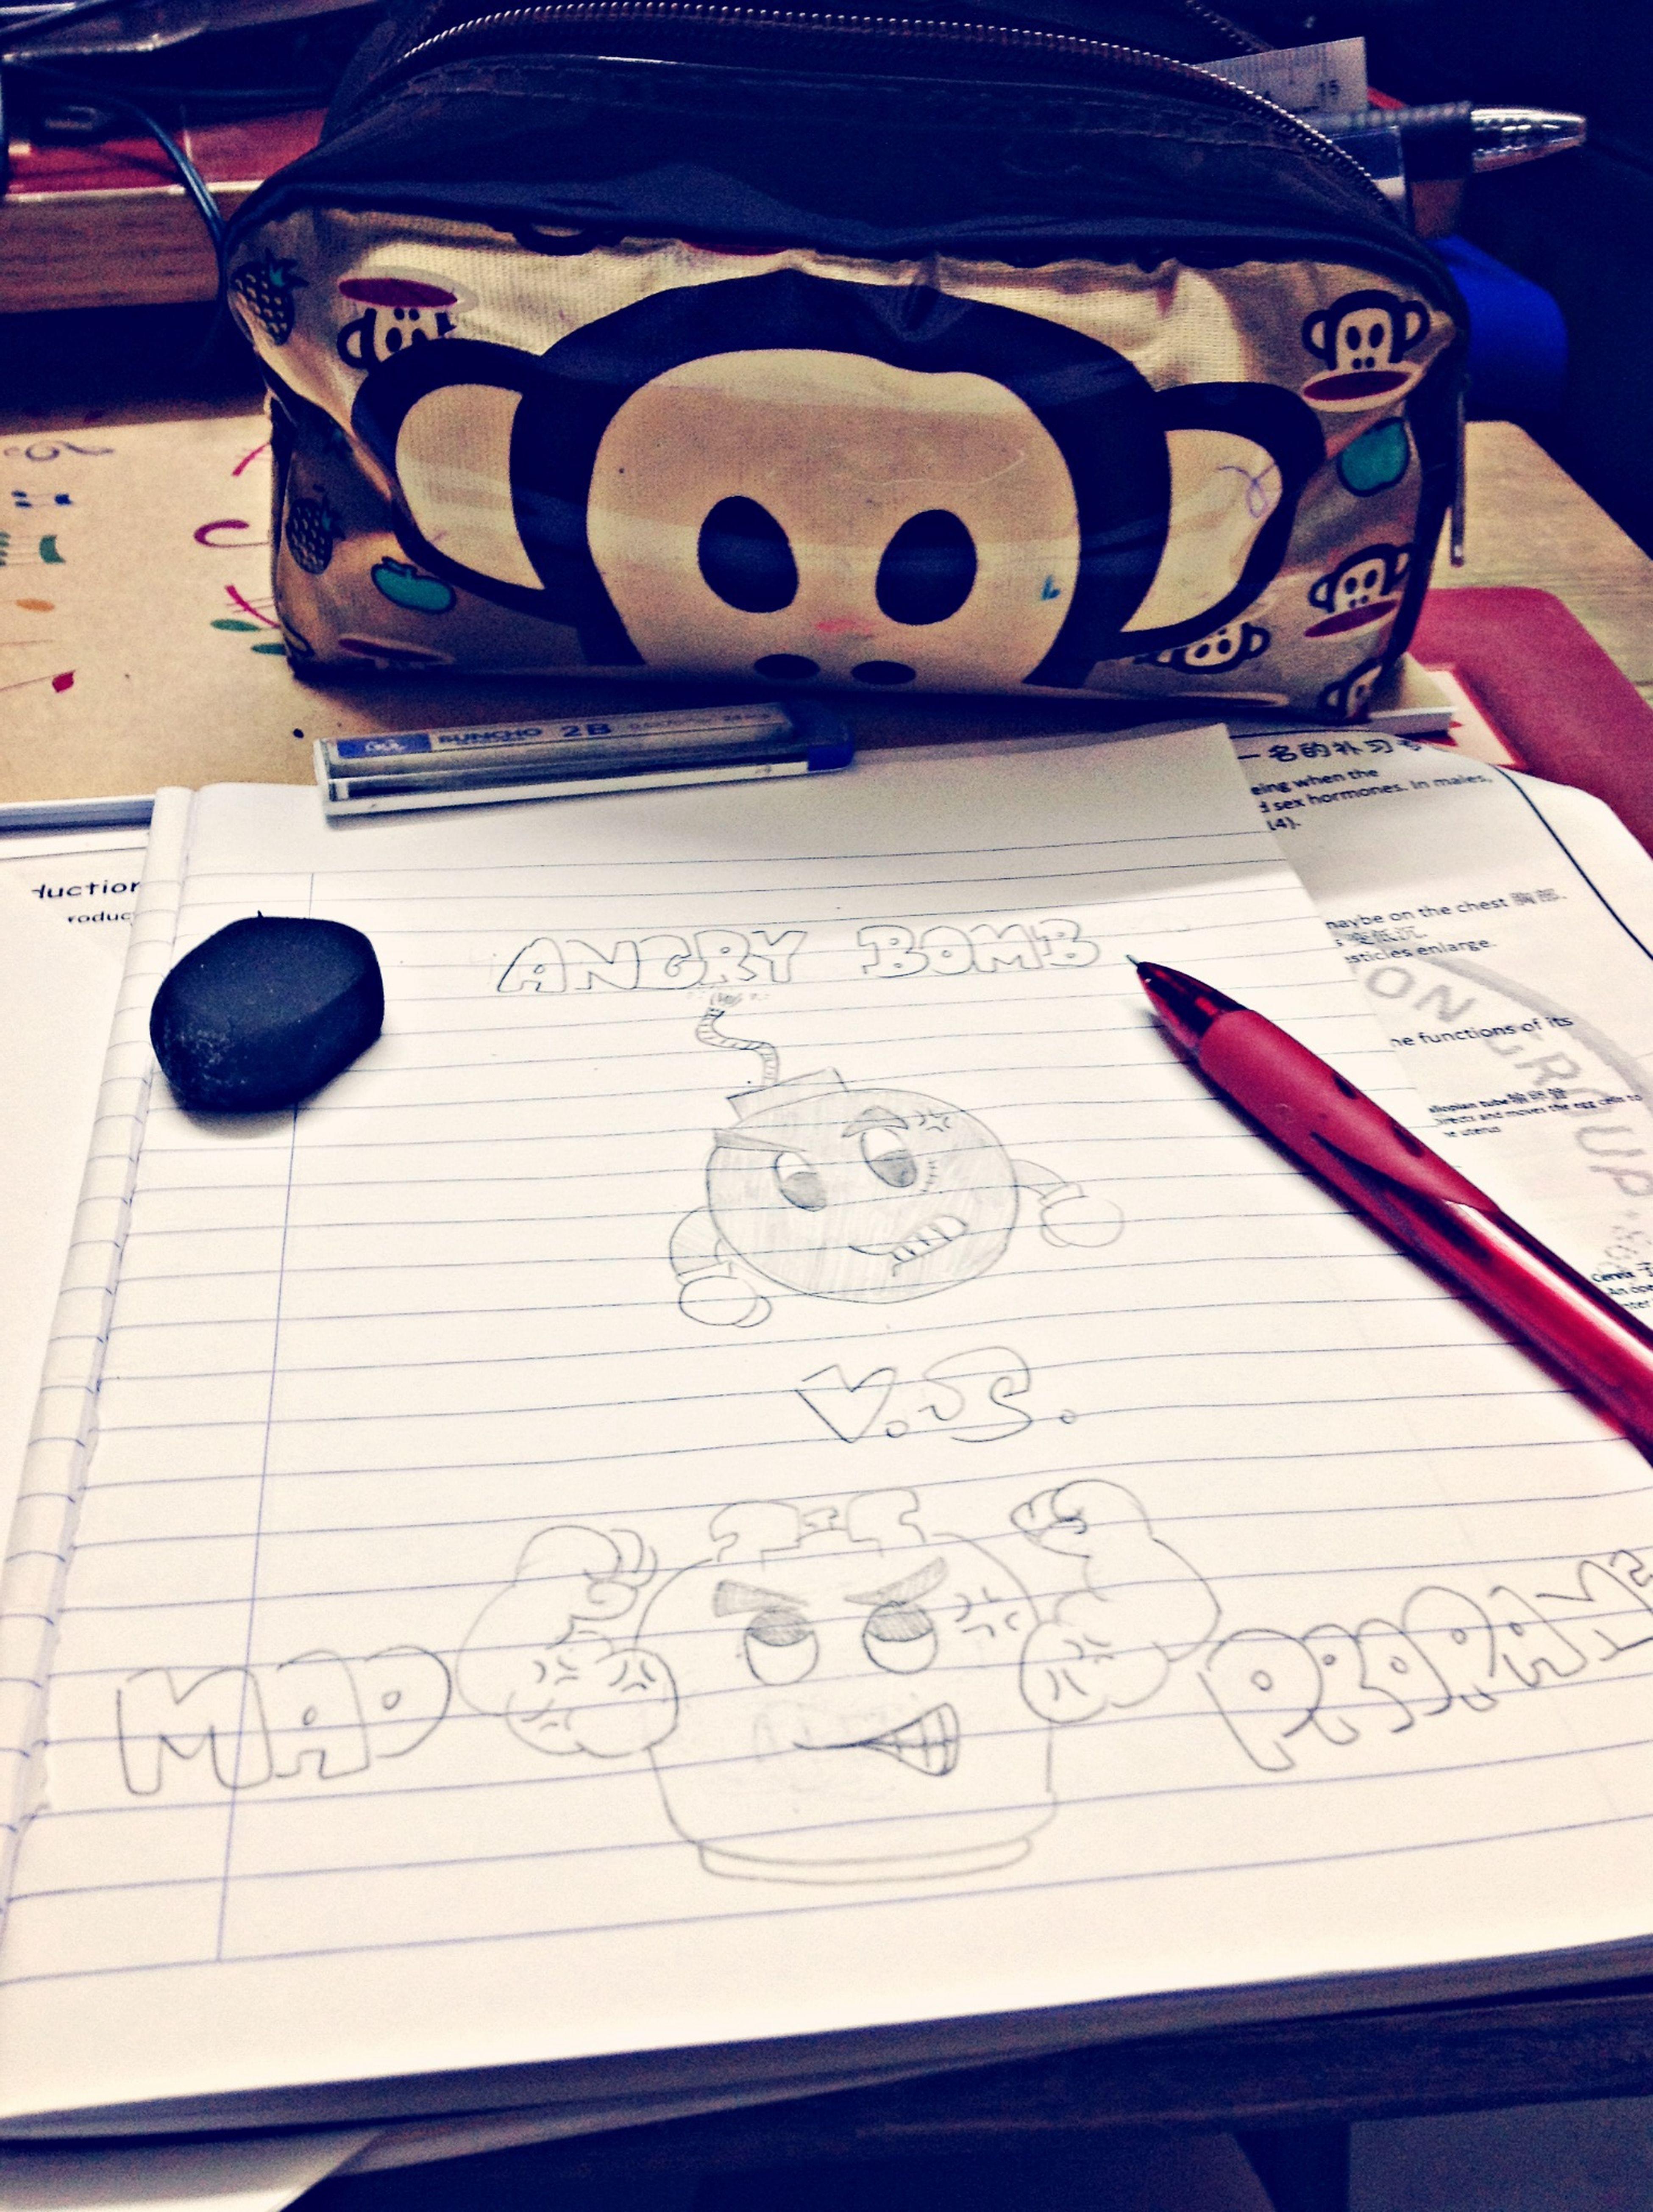 Boring while studying, so I draw this ahahaha. Angry Bomb V.S. Mad Propane